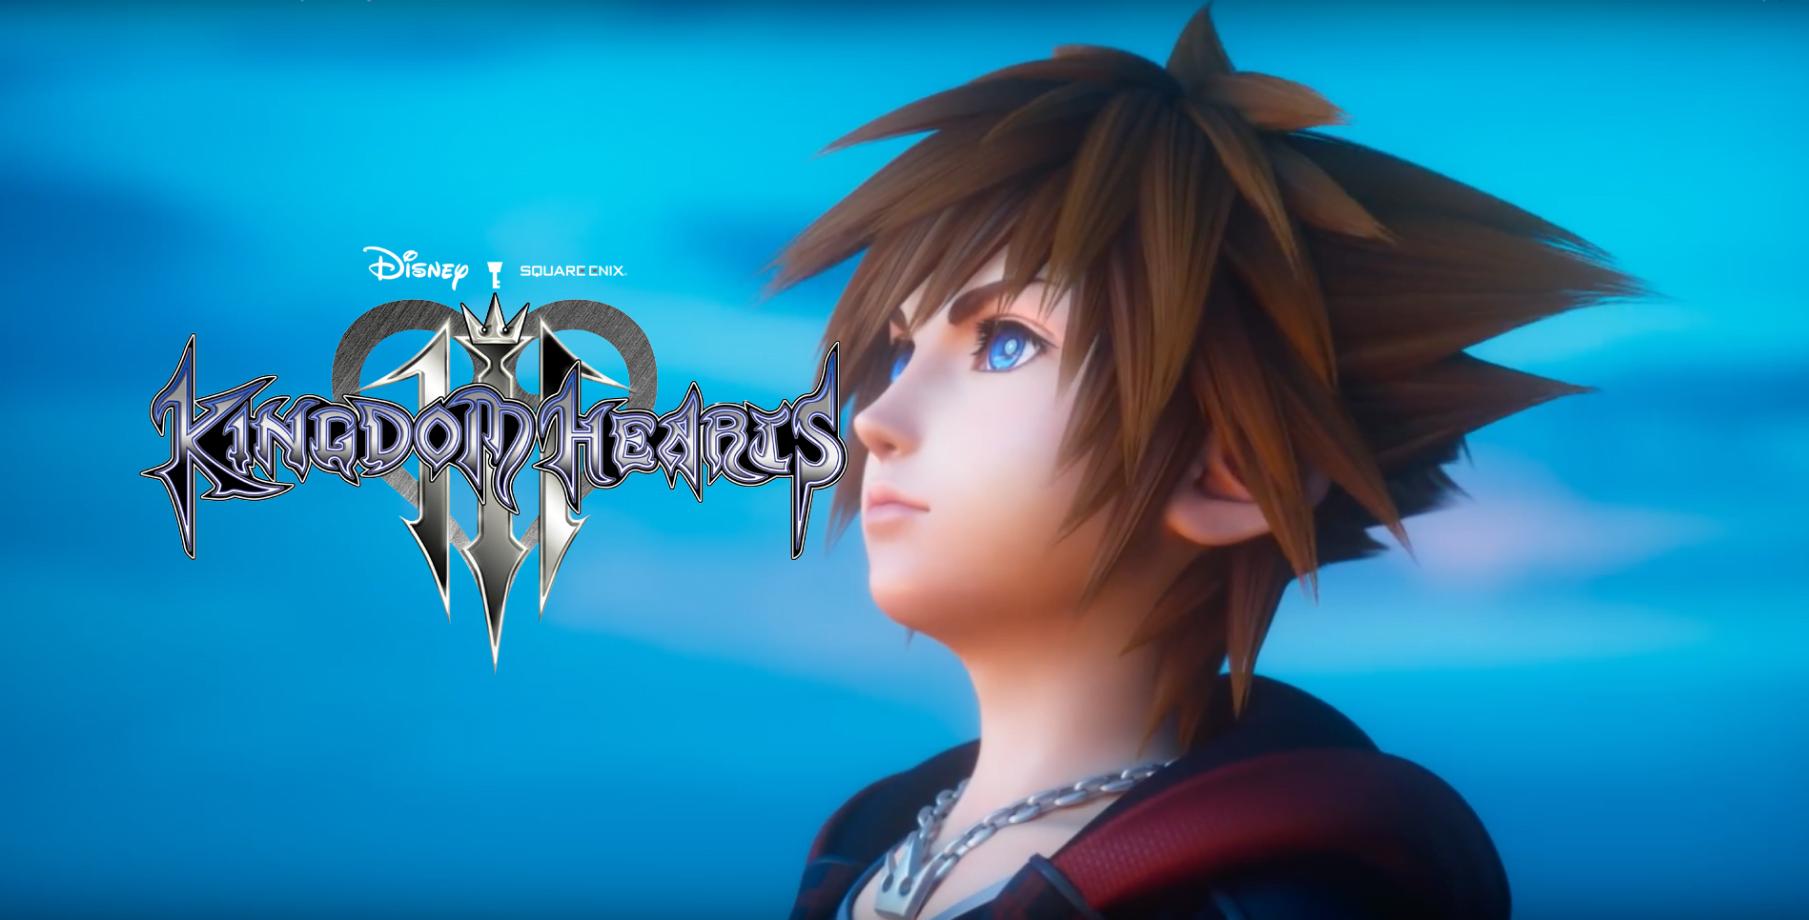 Kingdom Hearts Iii - Recensione, No Spoiler! 1 - Hynerd.it